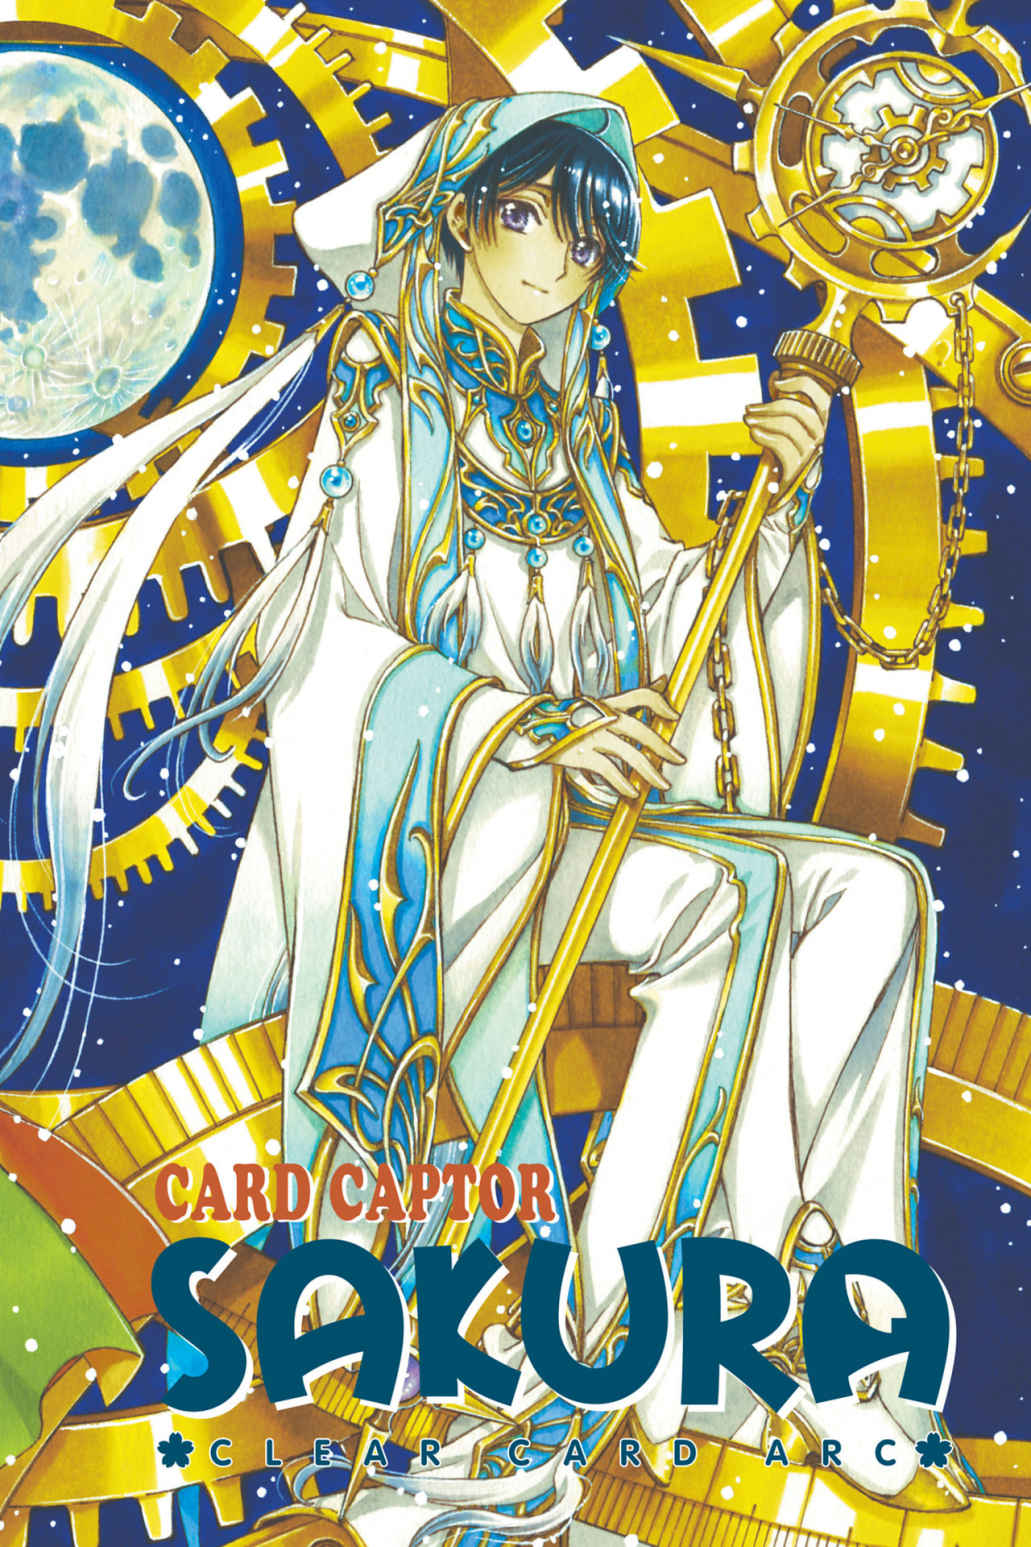 Card Captor Sakura et autres mangas [CLAMP] - Page 39 Cardca10